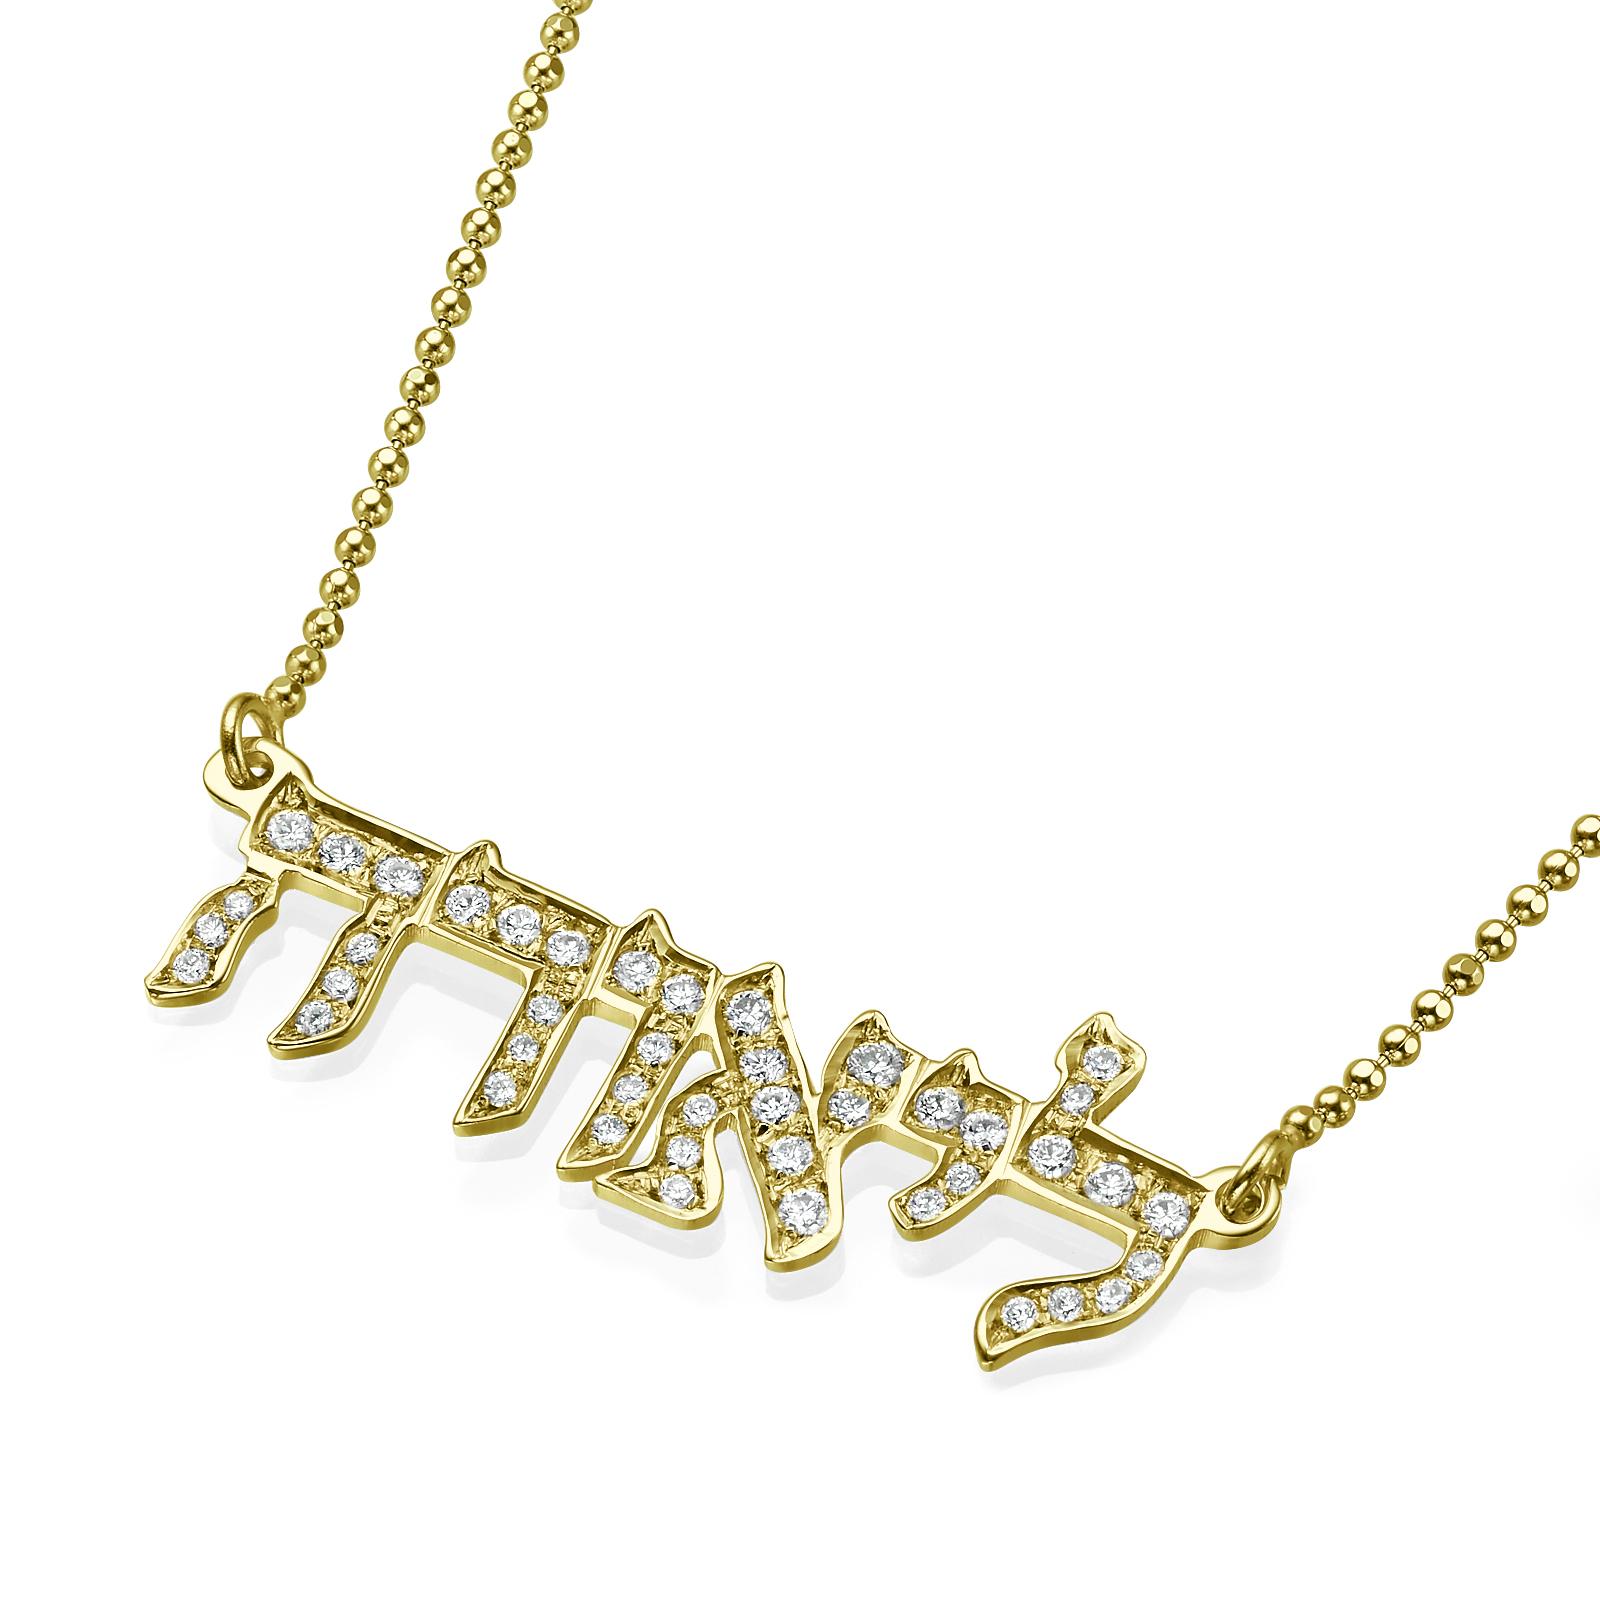 Diamond Hebrew Name Necklace - Yellow Gold - Baltinester Jewelry